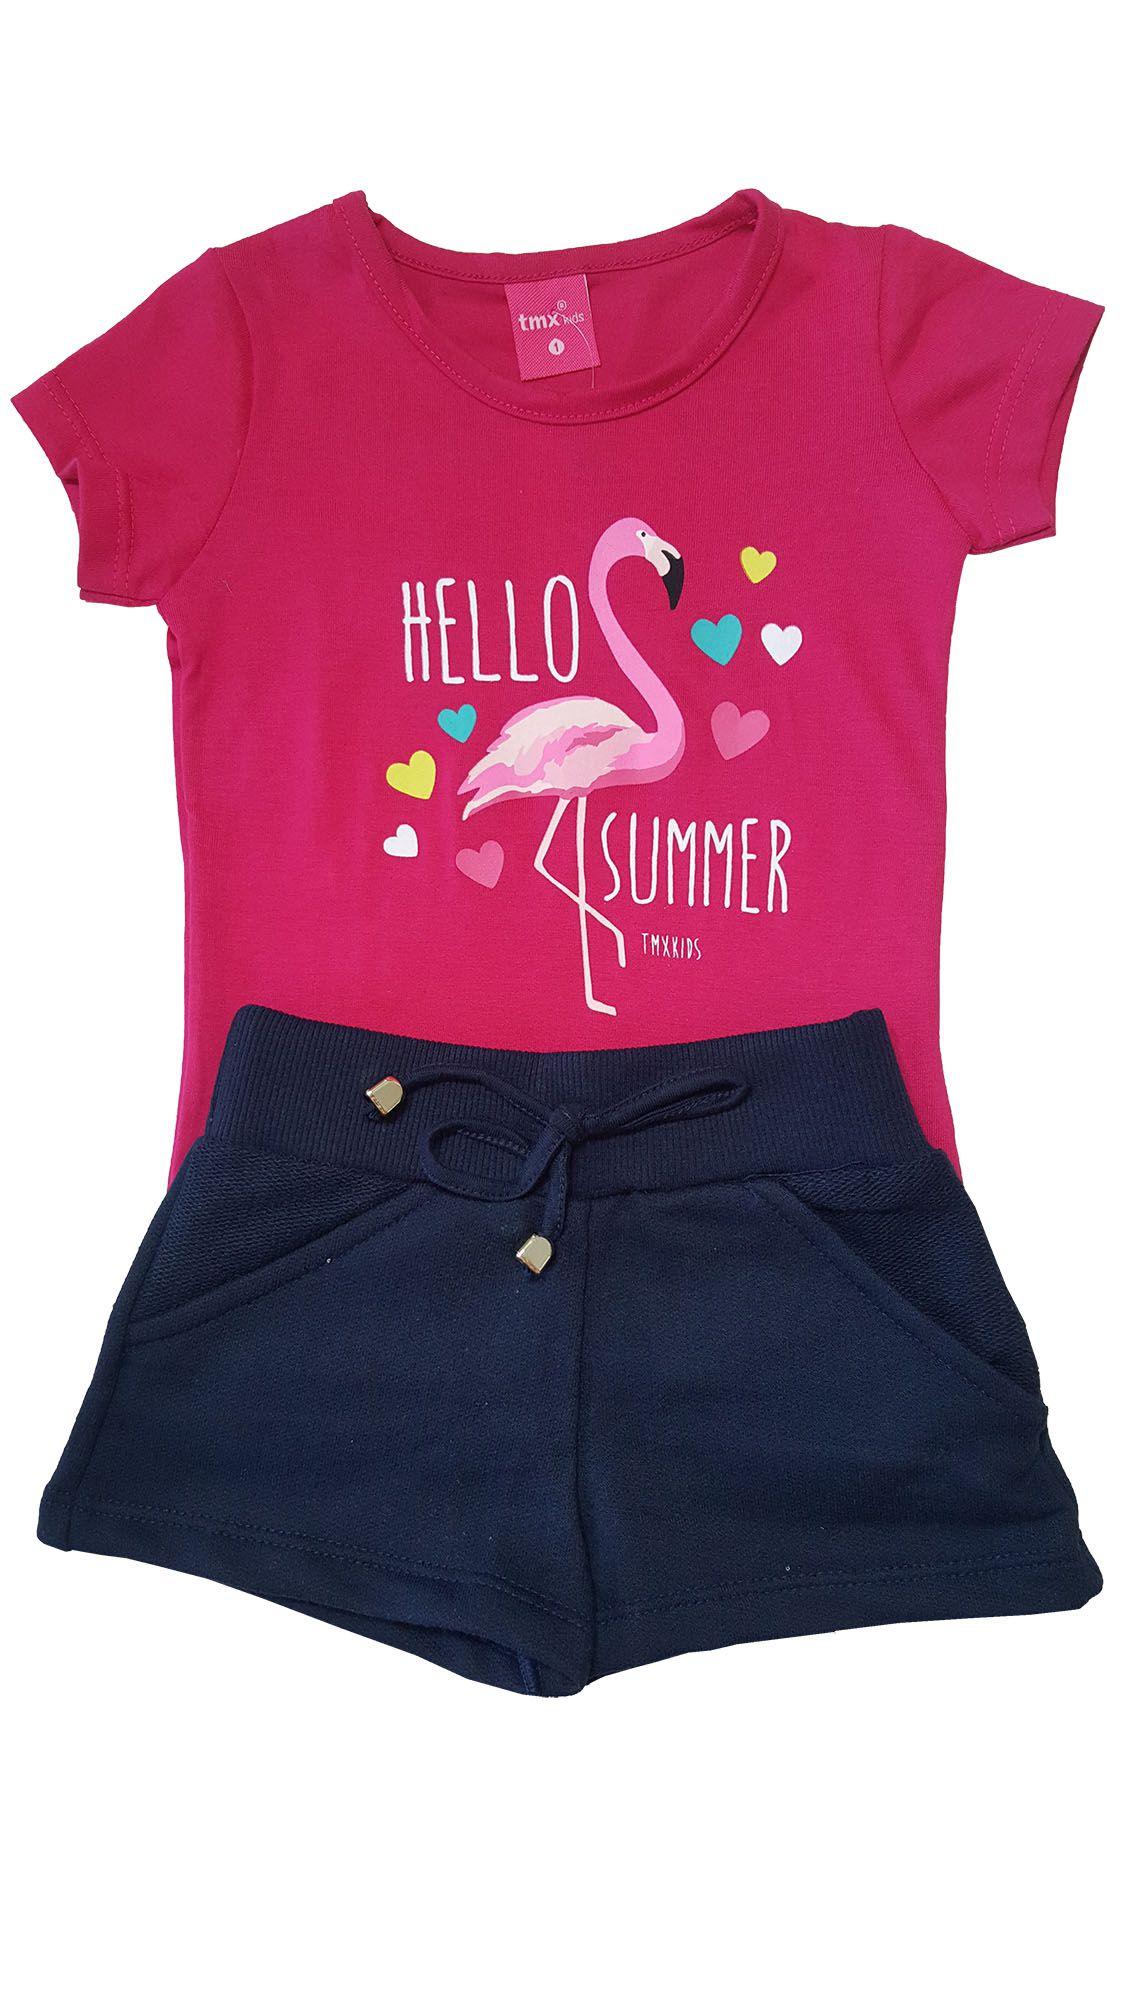 Conjunto Blusa e Shorts TMX  Hello Summer PinK/Marinho  Tamanho 2